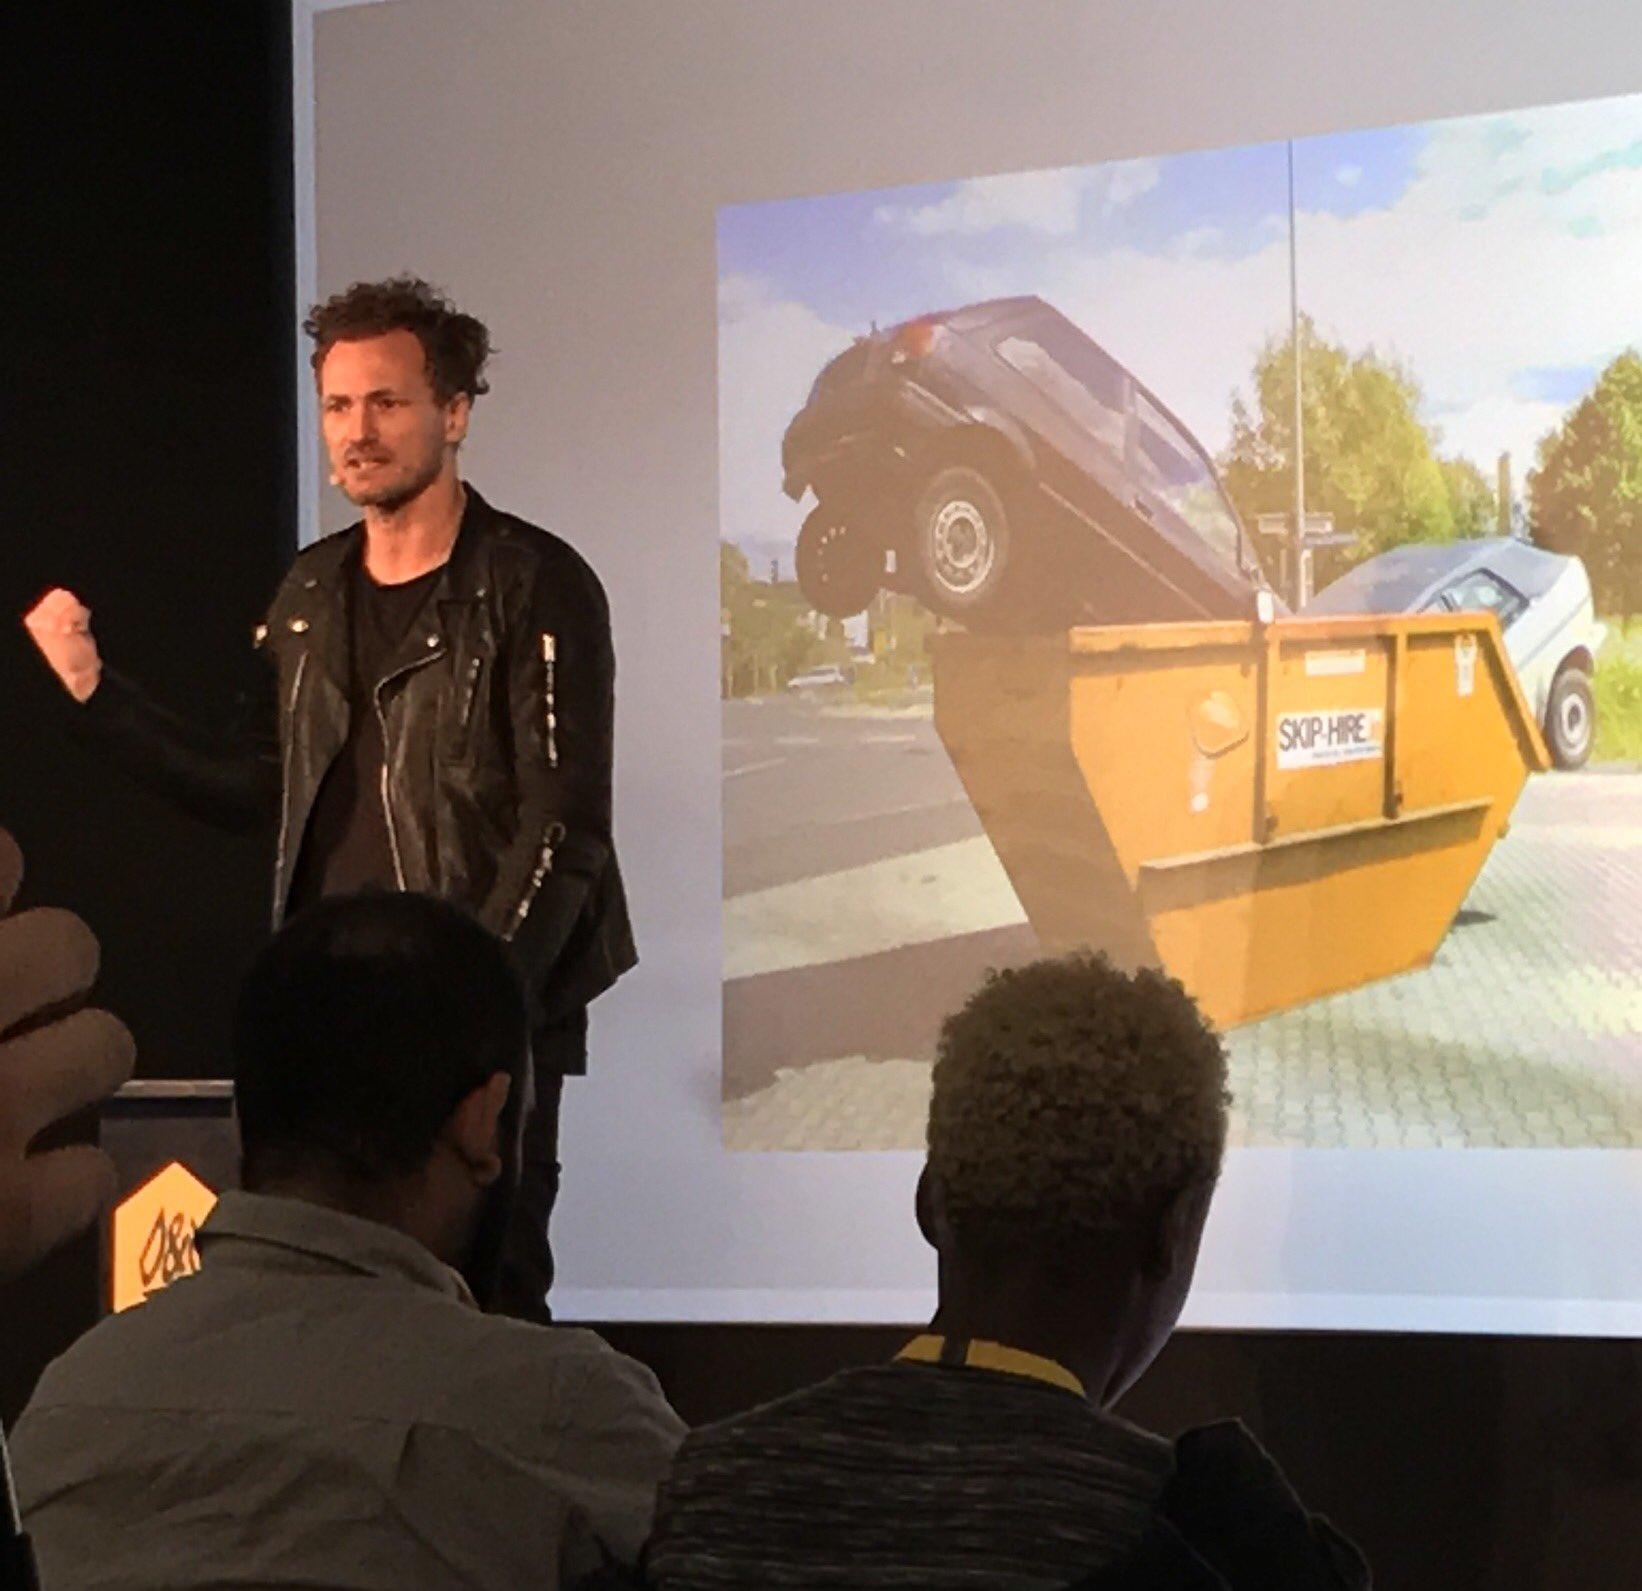 RT @mawiket: Listening in on briljant Thomas Kolster! @dandad #dandad17 #goodvertising @dogoodvertising https://t.co/bI2Yj3L44K